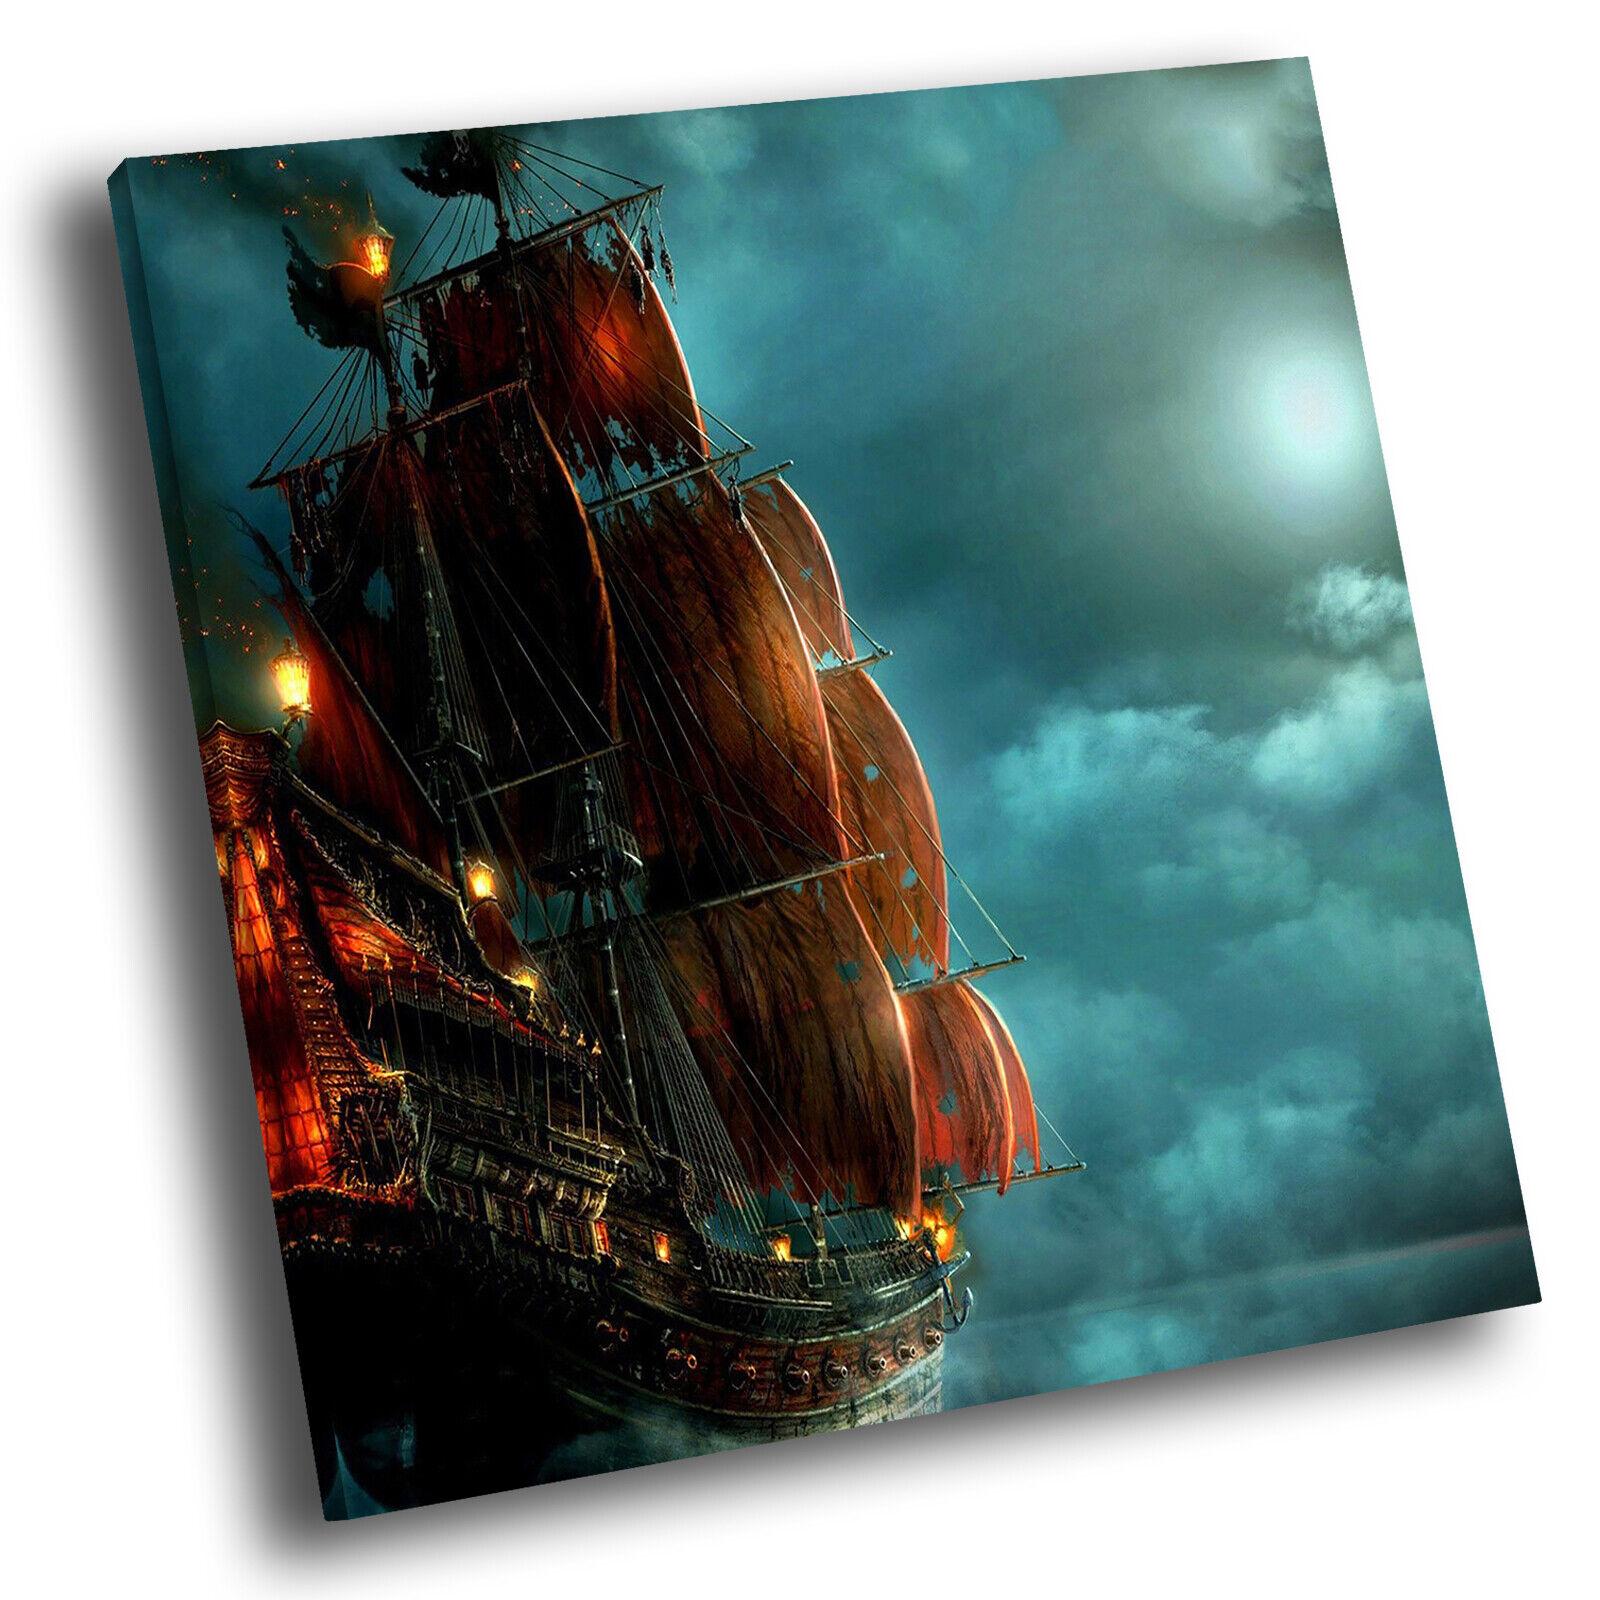 Blau Orange Ship Sea Square Abstract Photo Canvas Wall Art Large Picture Prints